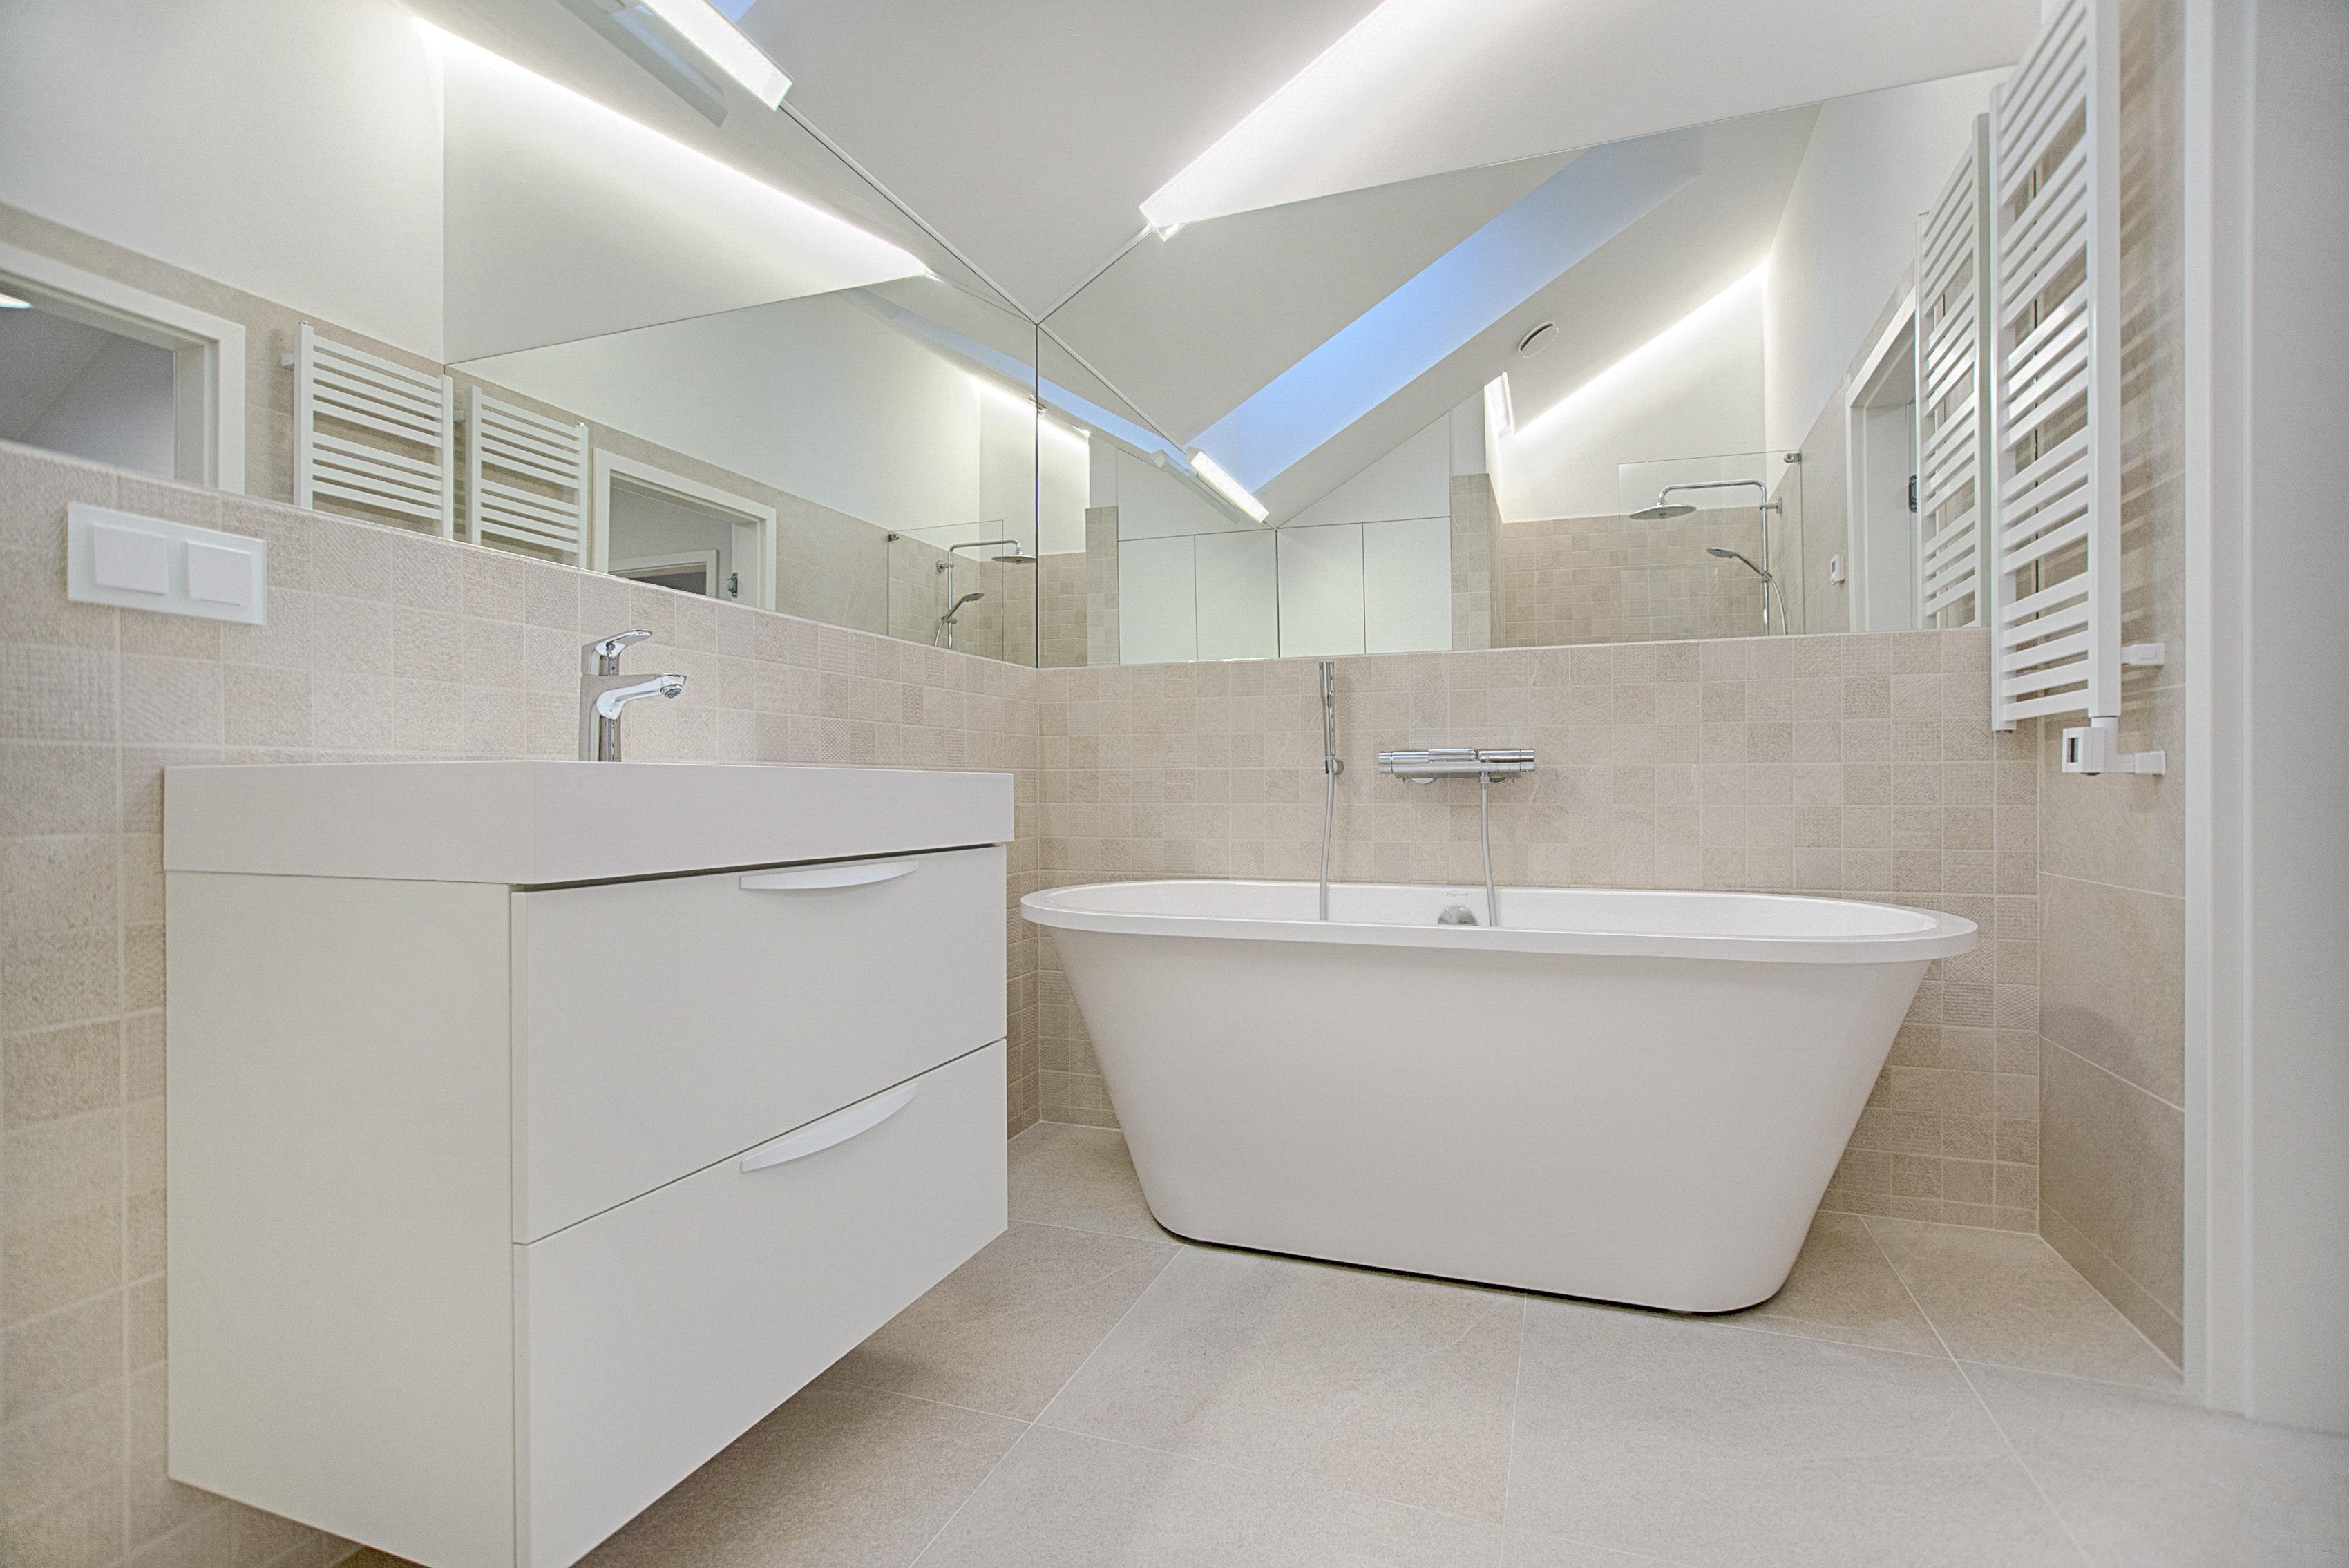 bathroom-bathtub-cabinet-1571461